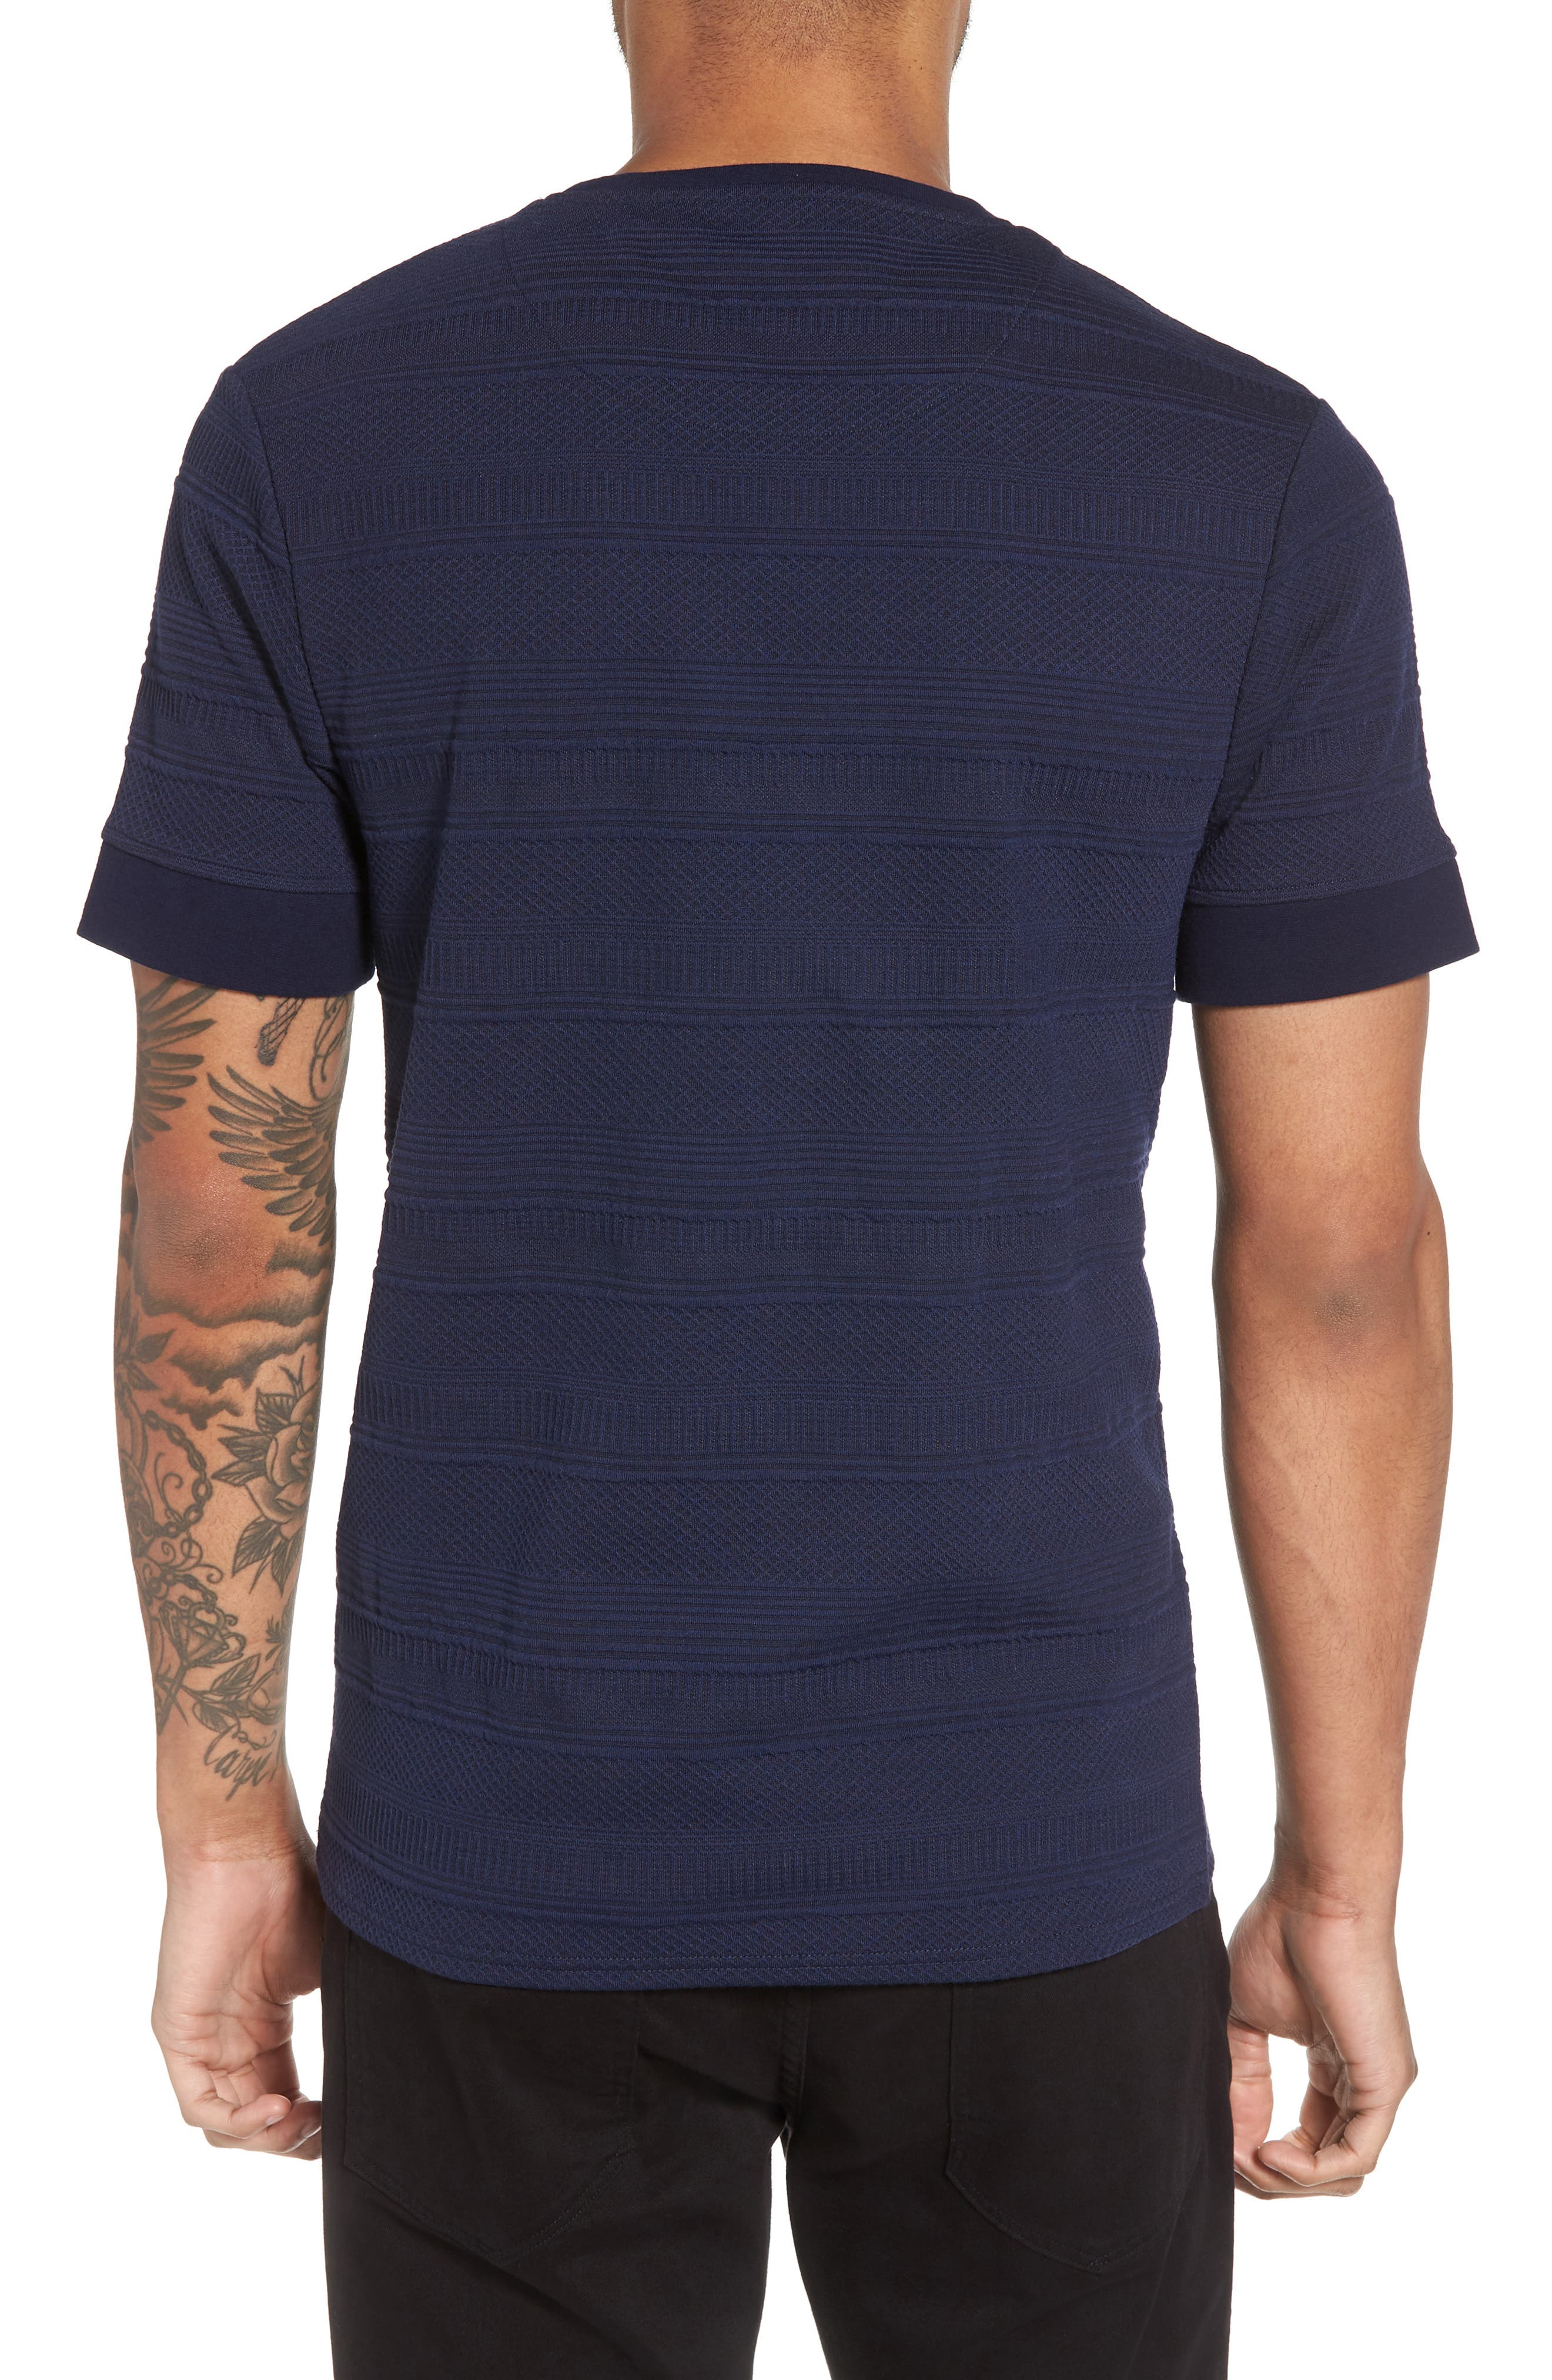 Banded Cuff Crewneck T-Shirt,                             Alternate thumbnail 2, color,                             Navy/Black